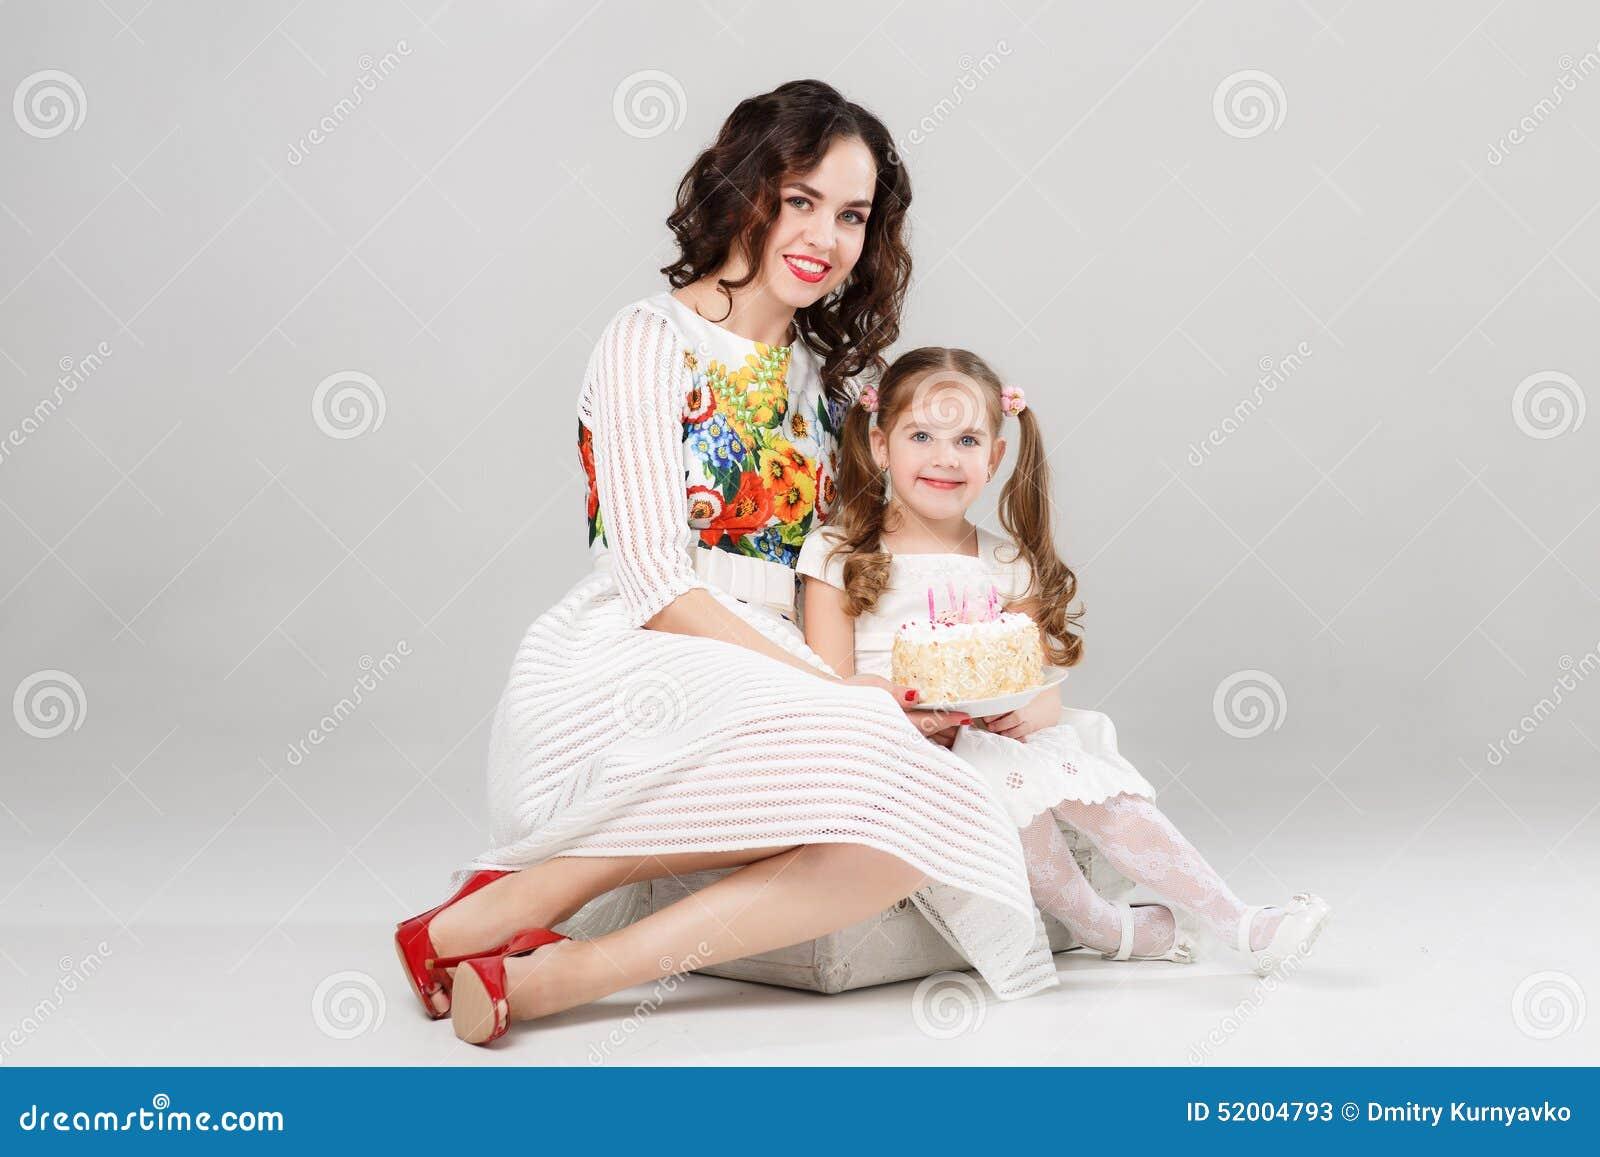 Madre E Hija Que Se Divierten Junto Que Celebra Cumpleanos Imagen De